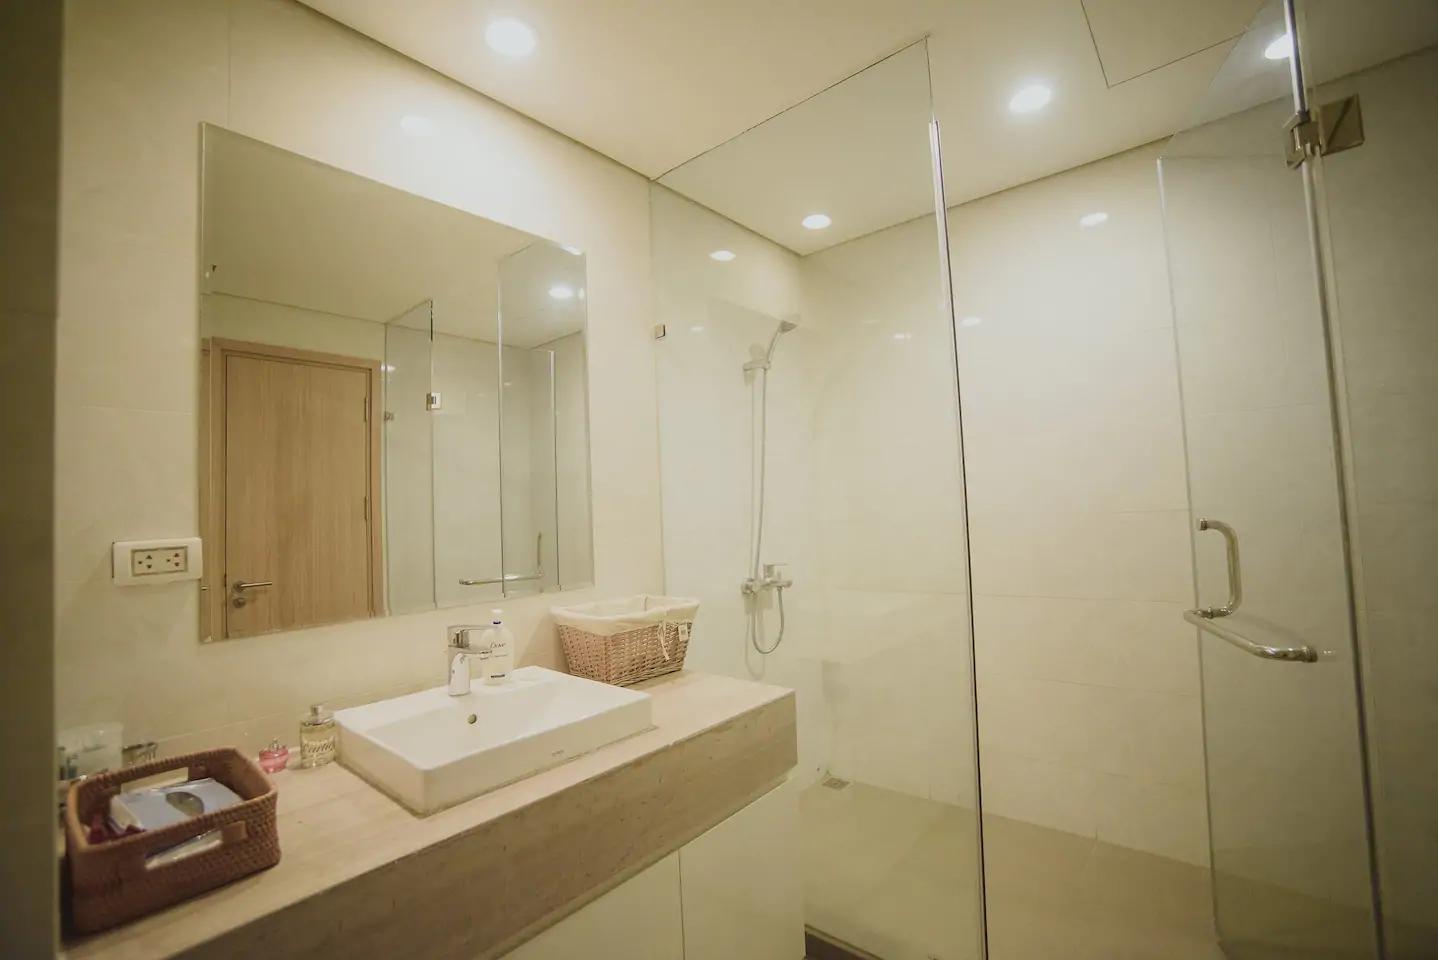 Bayhomes Mipec RiverSide Apartment , Long Biên